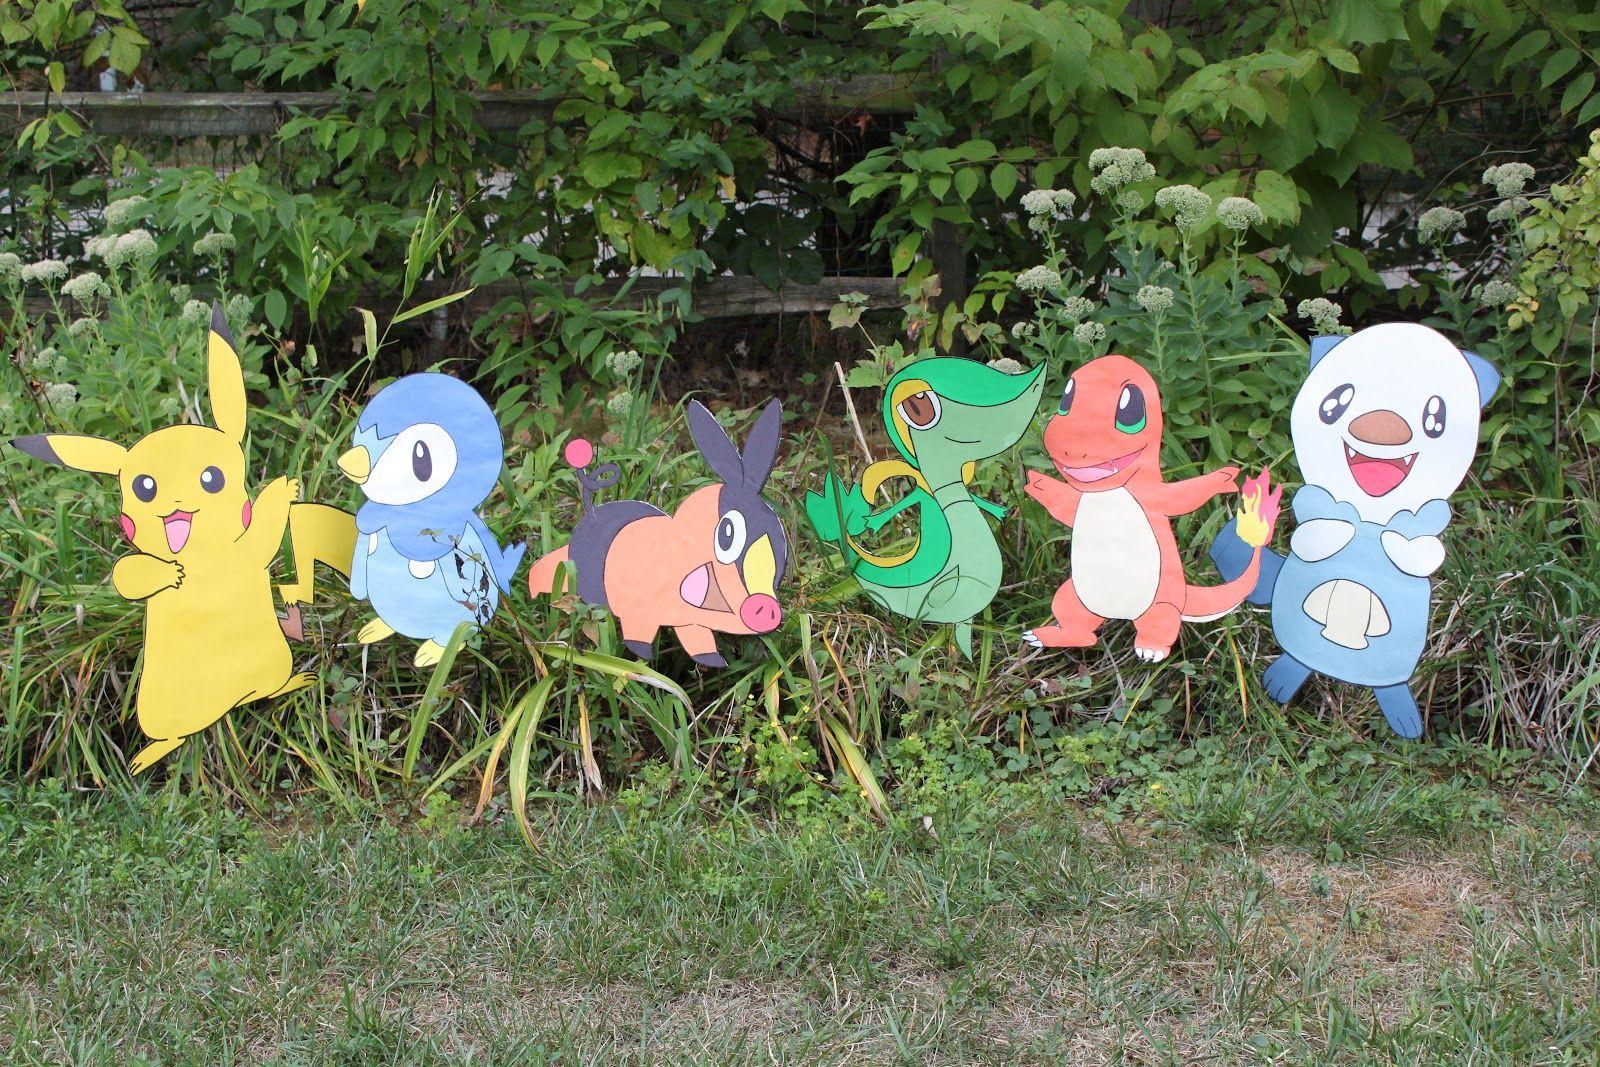 Pokemon garden decorations | DIY and crafts | Pinterest | Pokémon ...